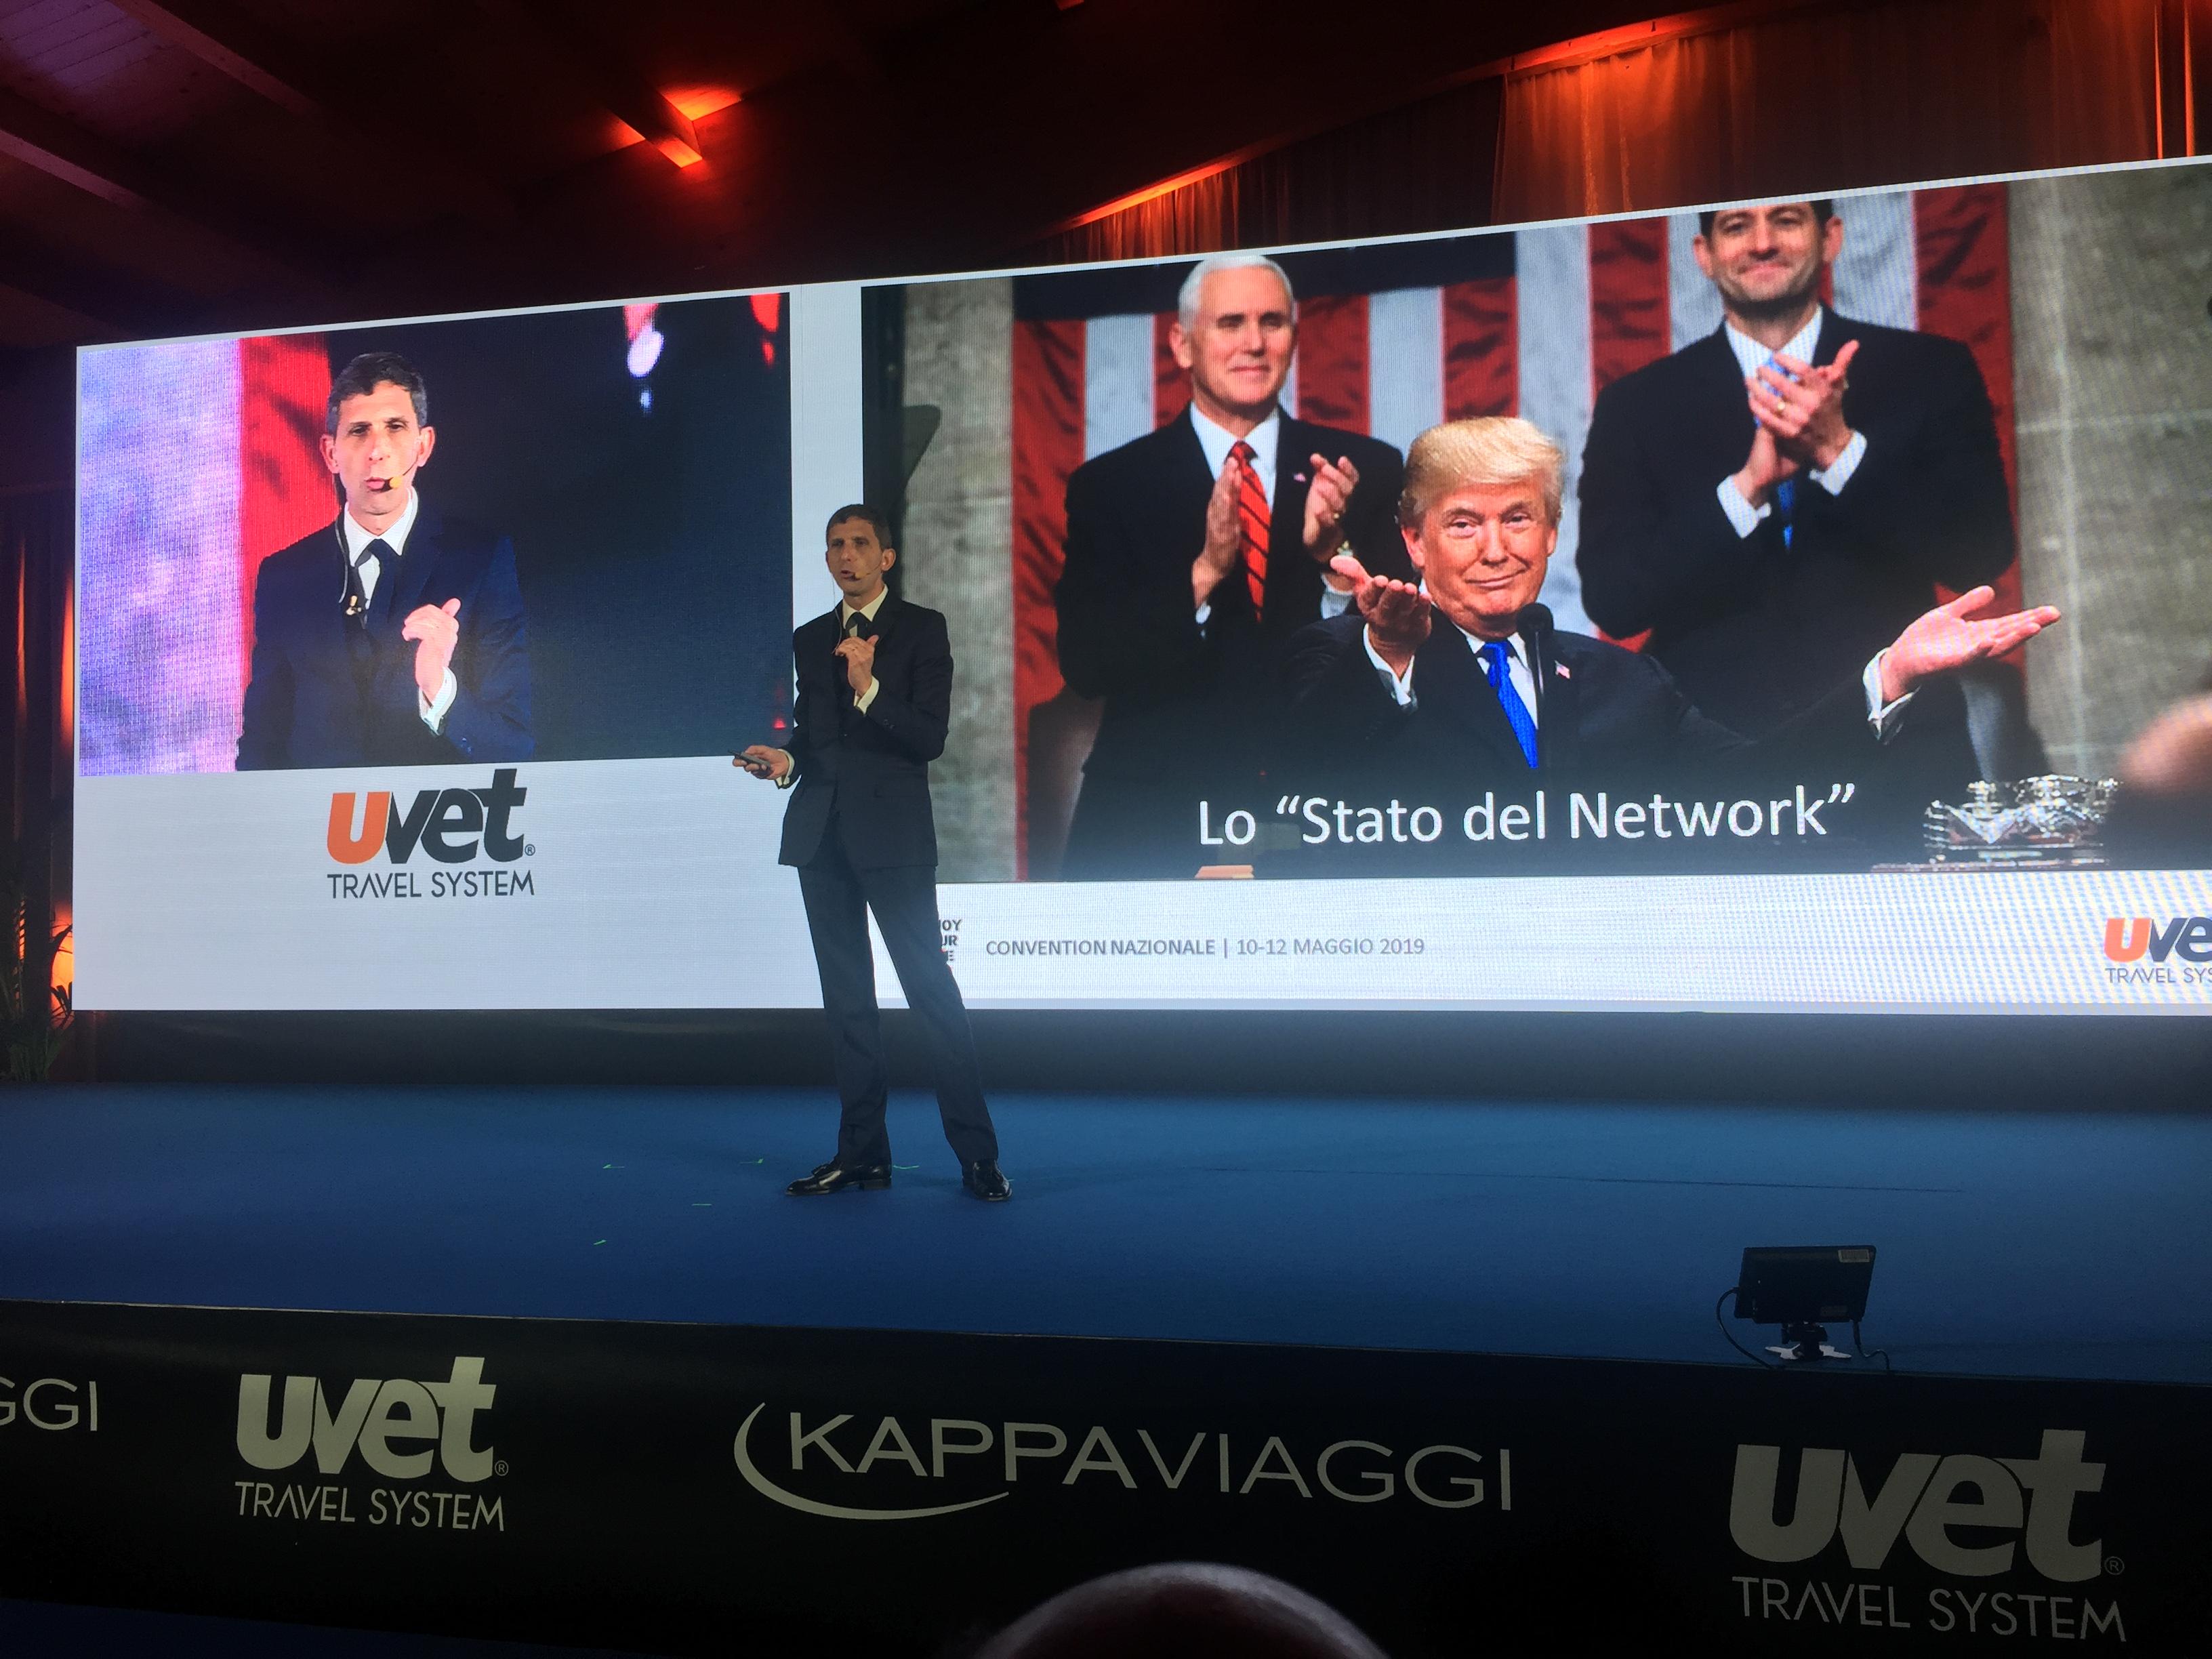 Andrea Gilardi, DG Uvet Travel System